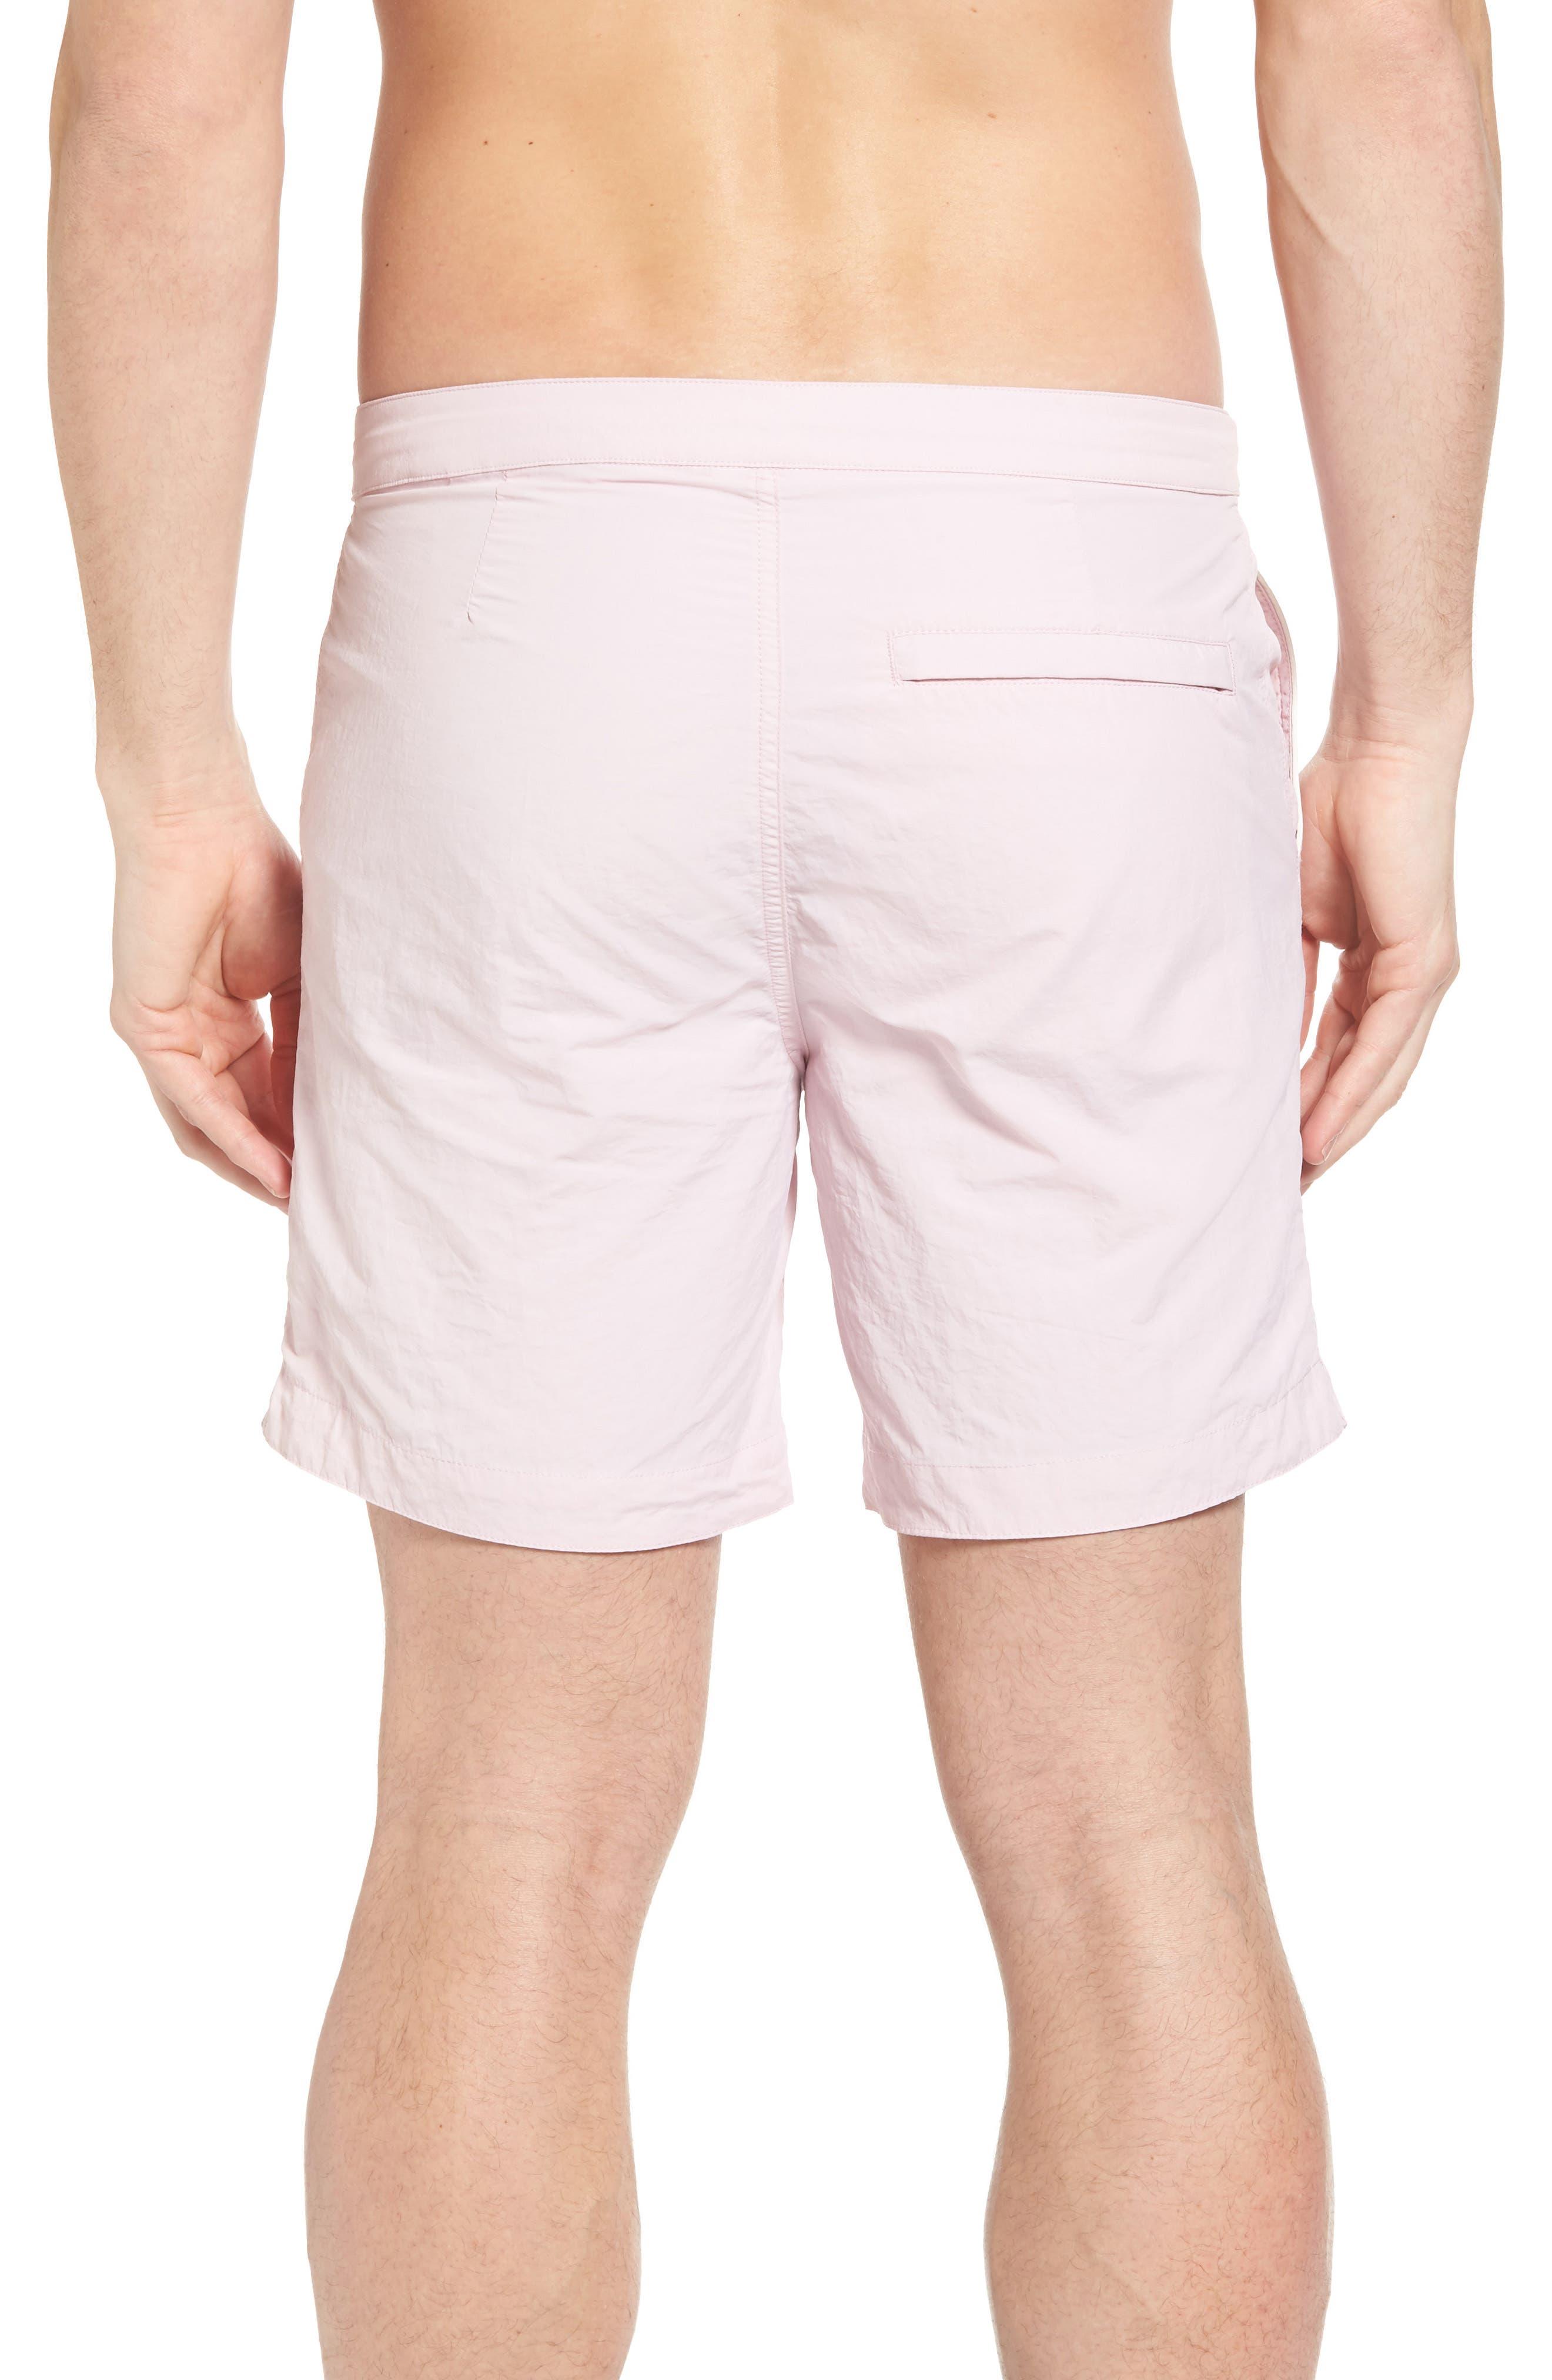 Rio Regular Fit Swim Trunks,                             Alternate thumbnail 2, color,                             Pastel Pink Solid